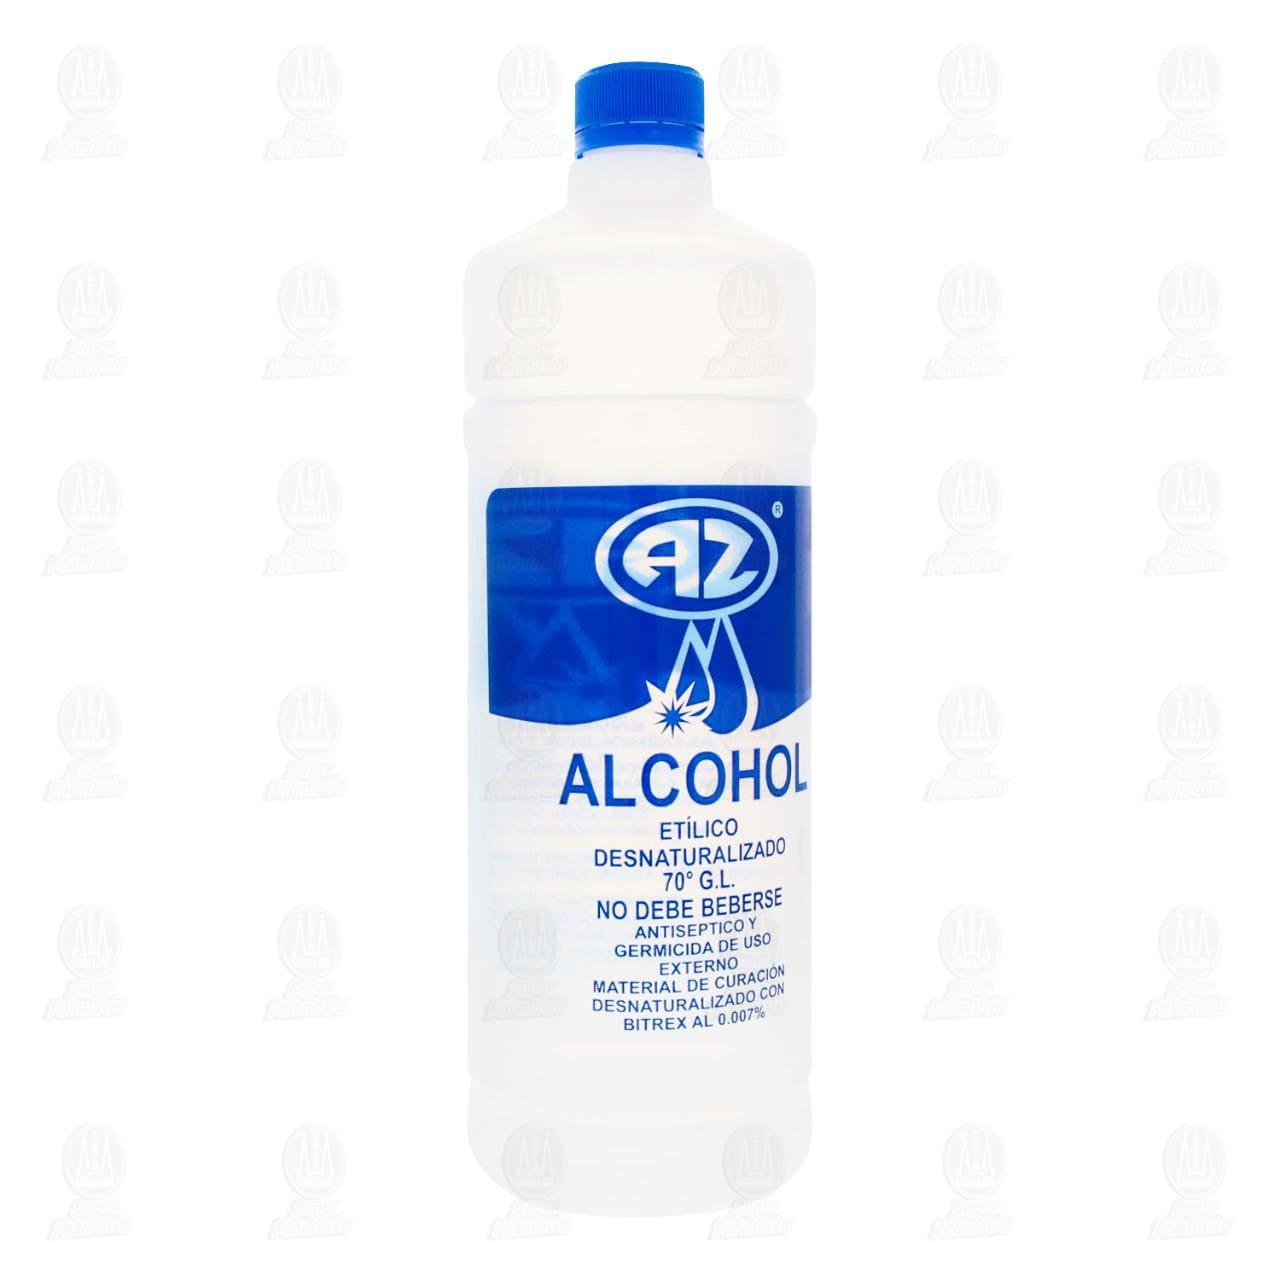 Comprar Alcohol Etílico AZ Desnaturalizado 70° Azul 1l en Farmacias Guadalajara